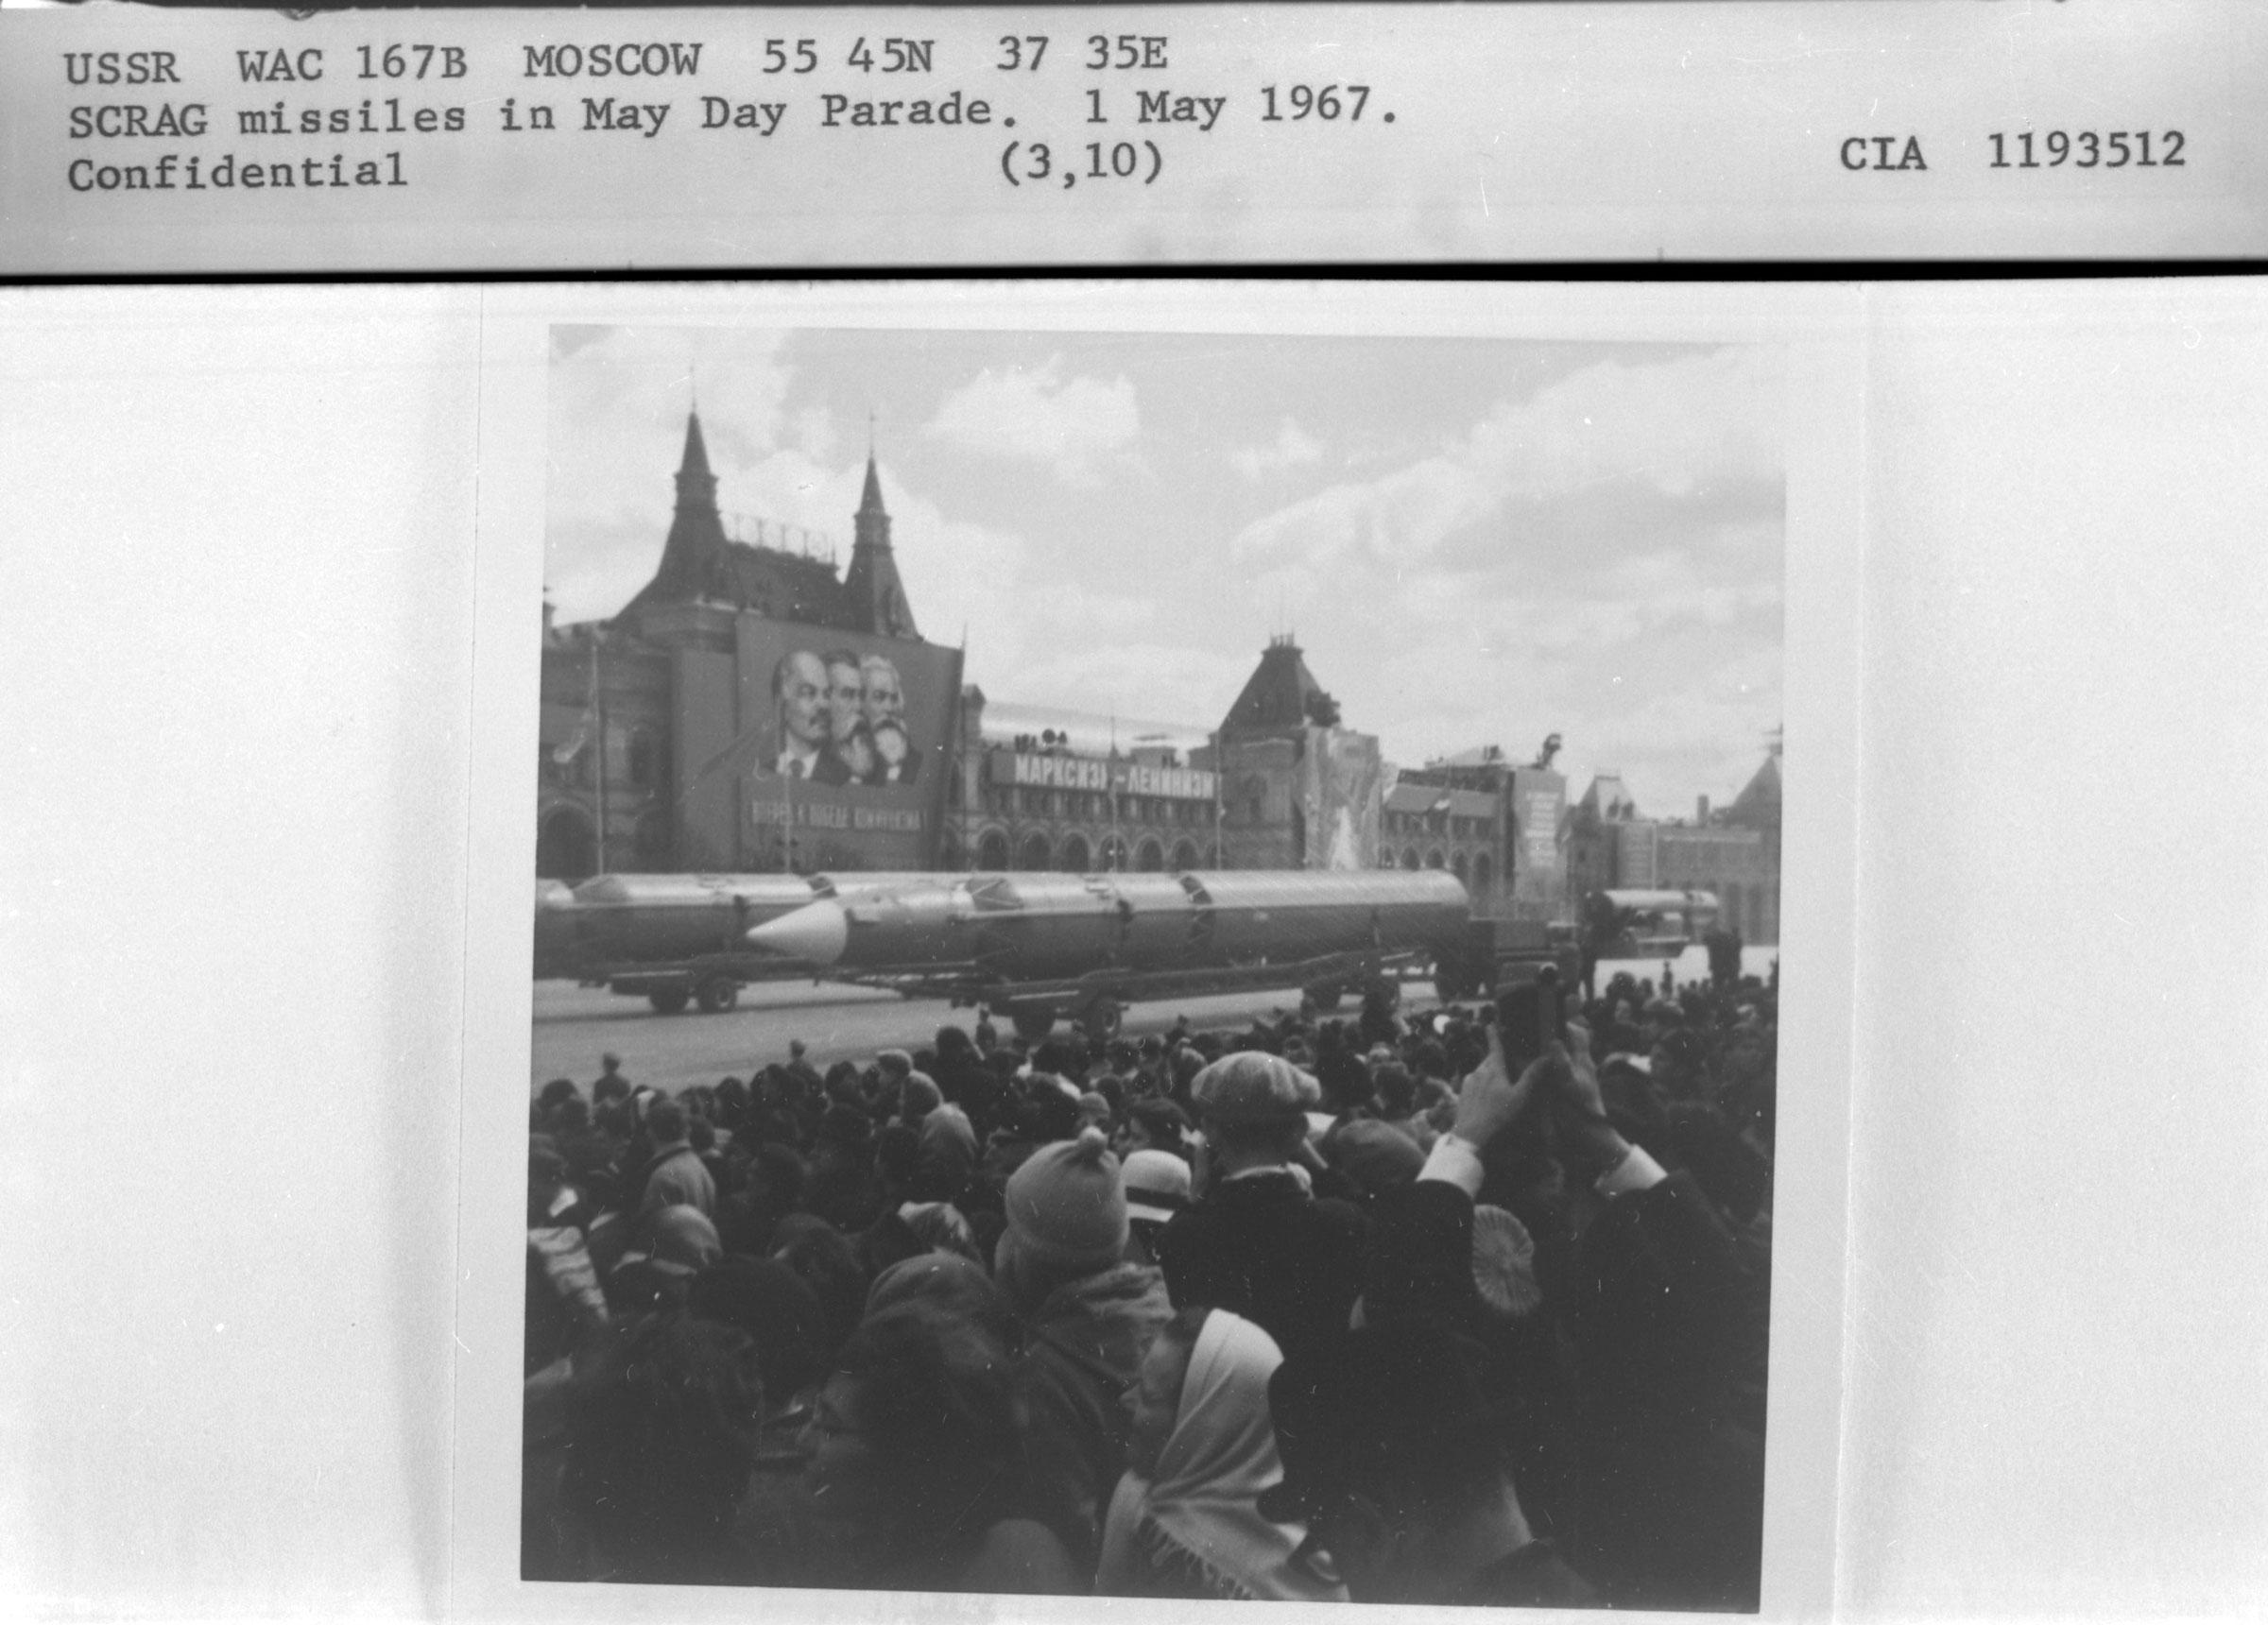 scrag-1967-may-day